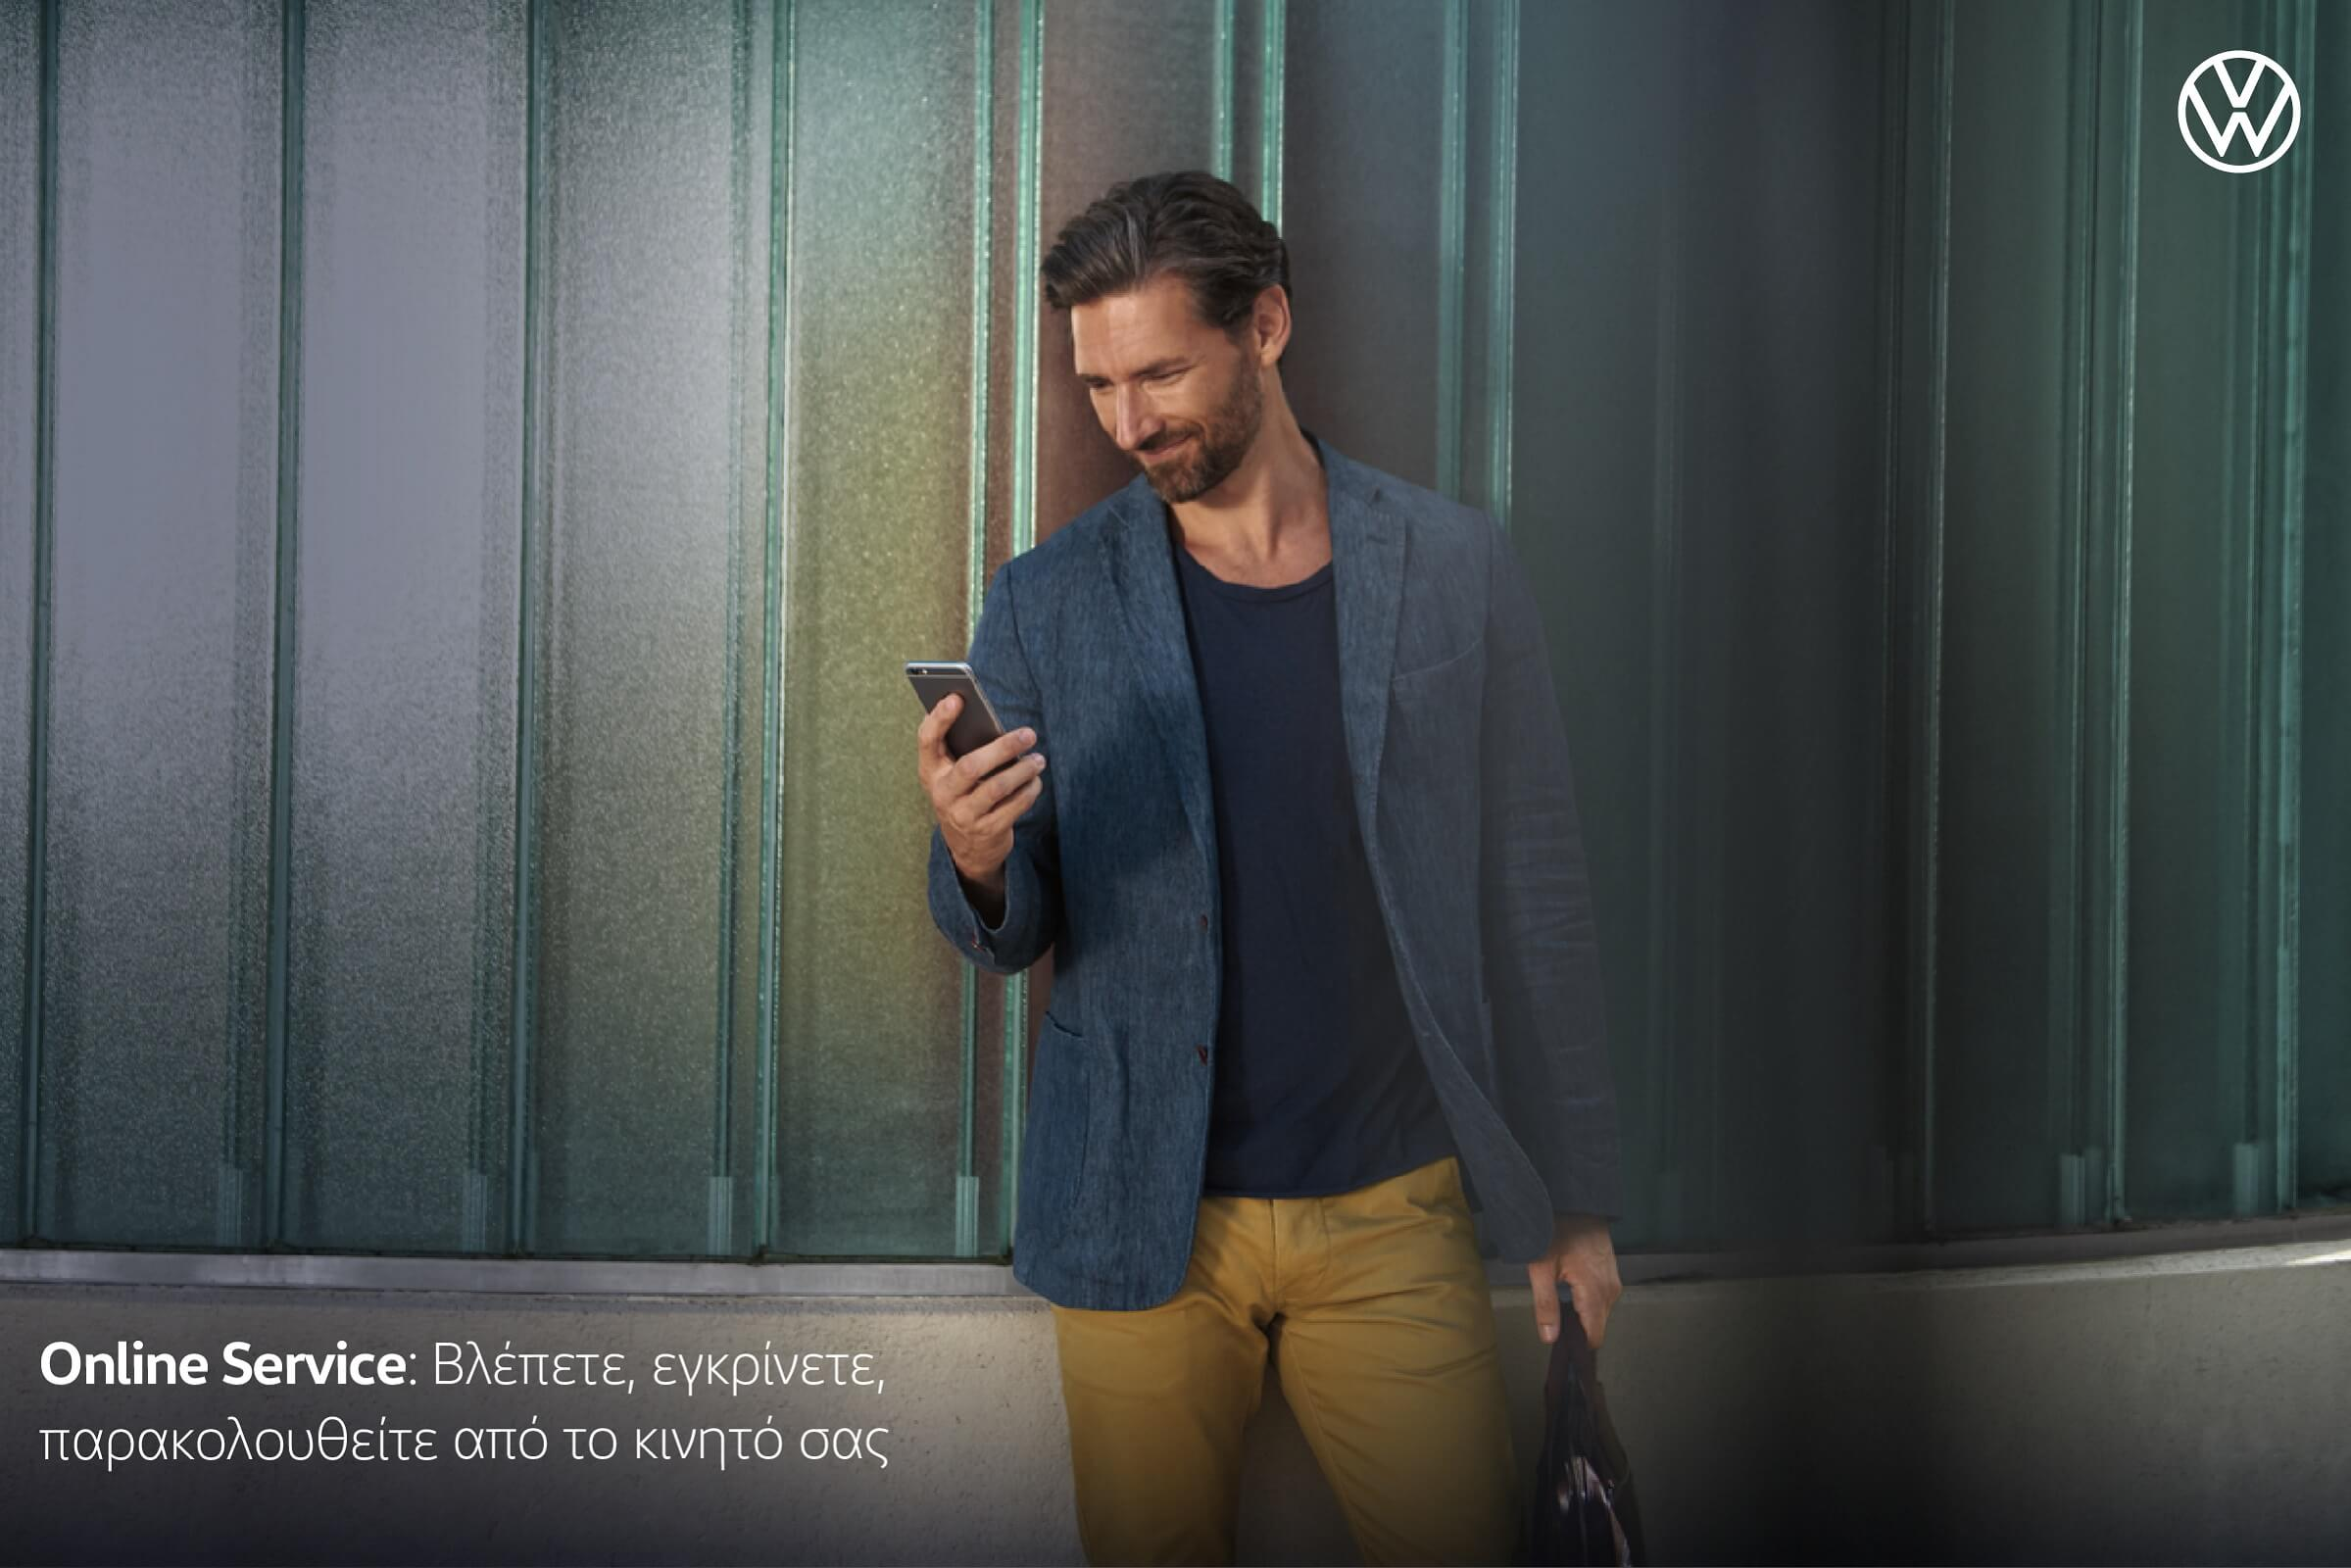 Volkswagen After Sales - Υπηρεσία Online Service - Ενημέρωση online για τις επιπλέον εργασίες μετά από τον έλεγχο στο service